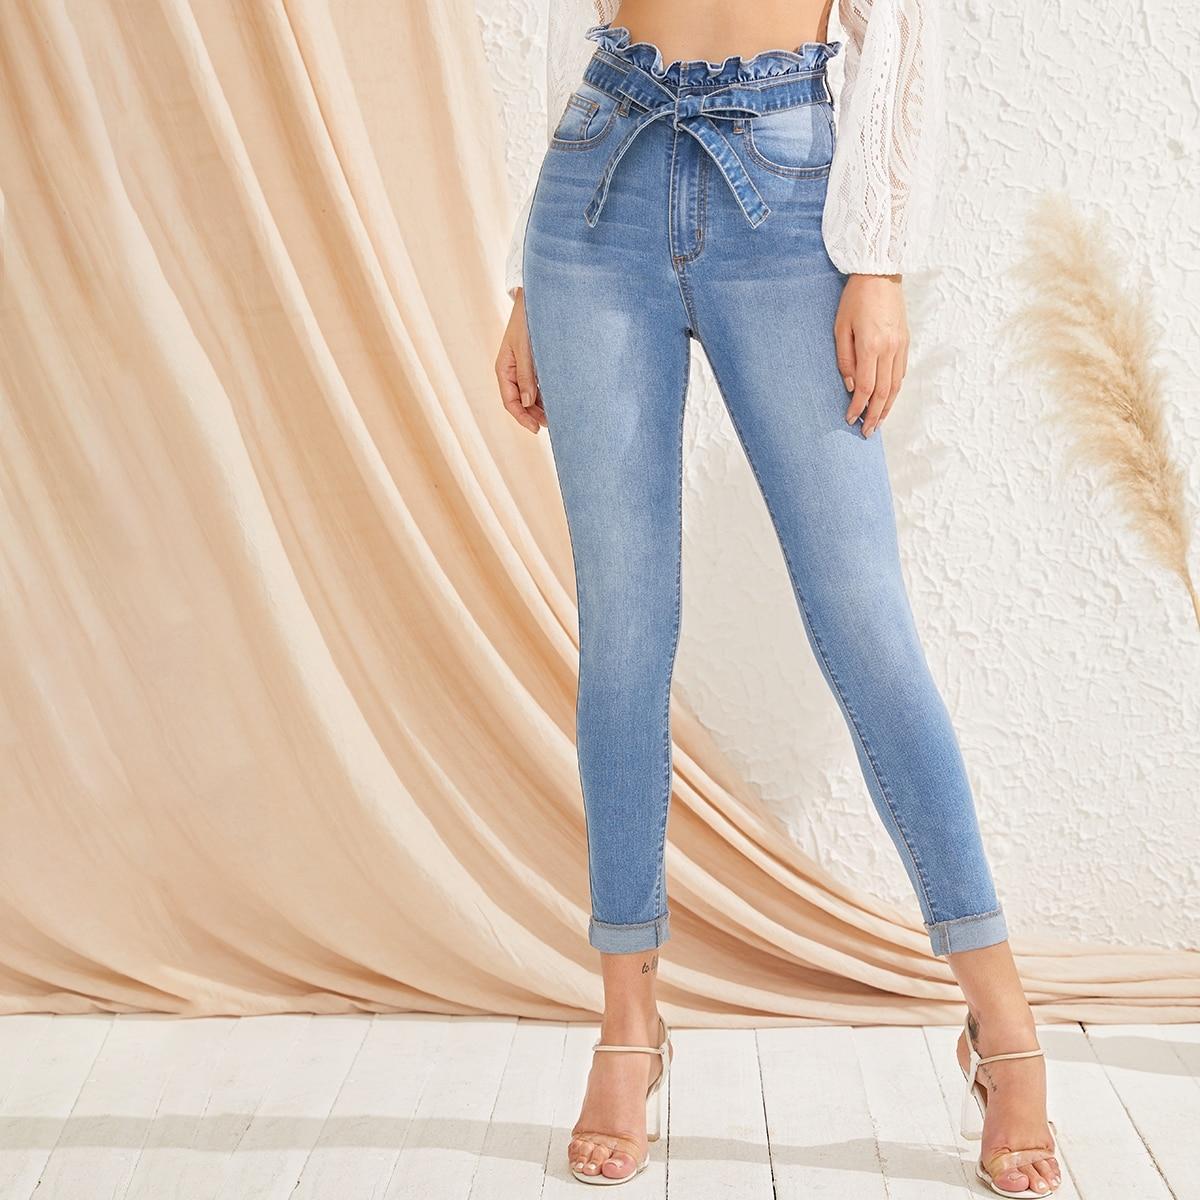 Bleach Wash High-Waisted High Stretch Skinny Jeans